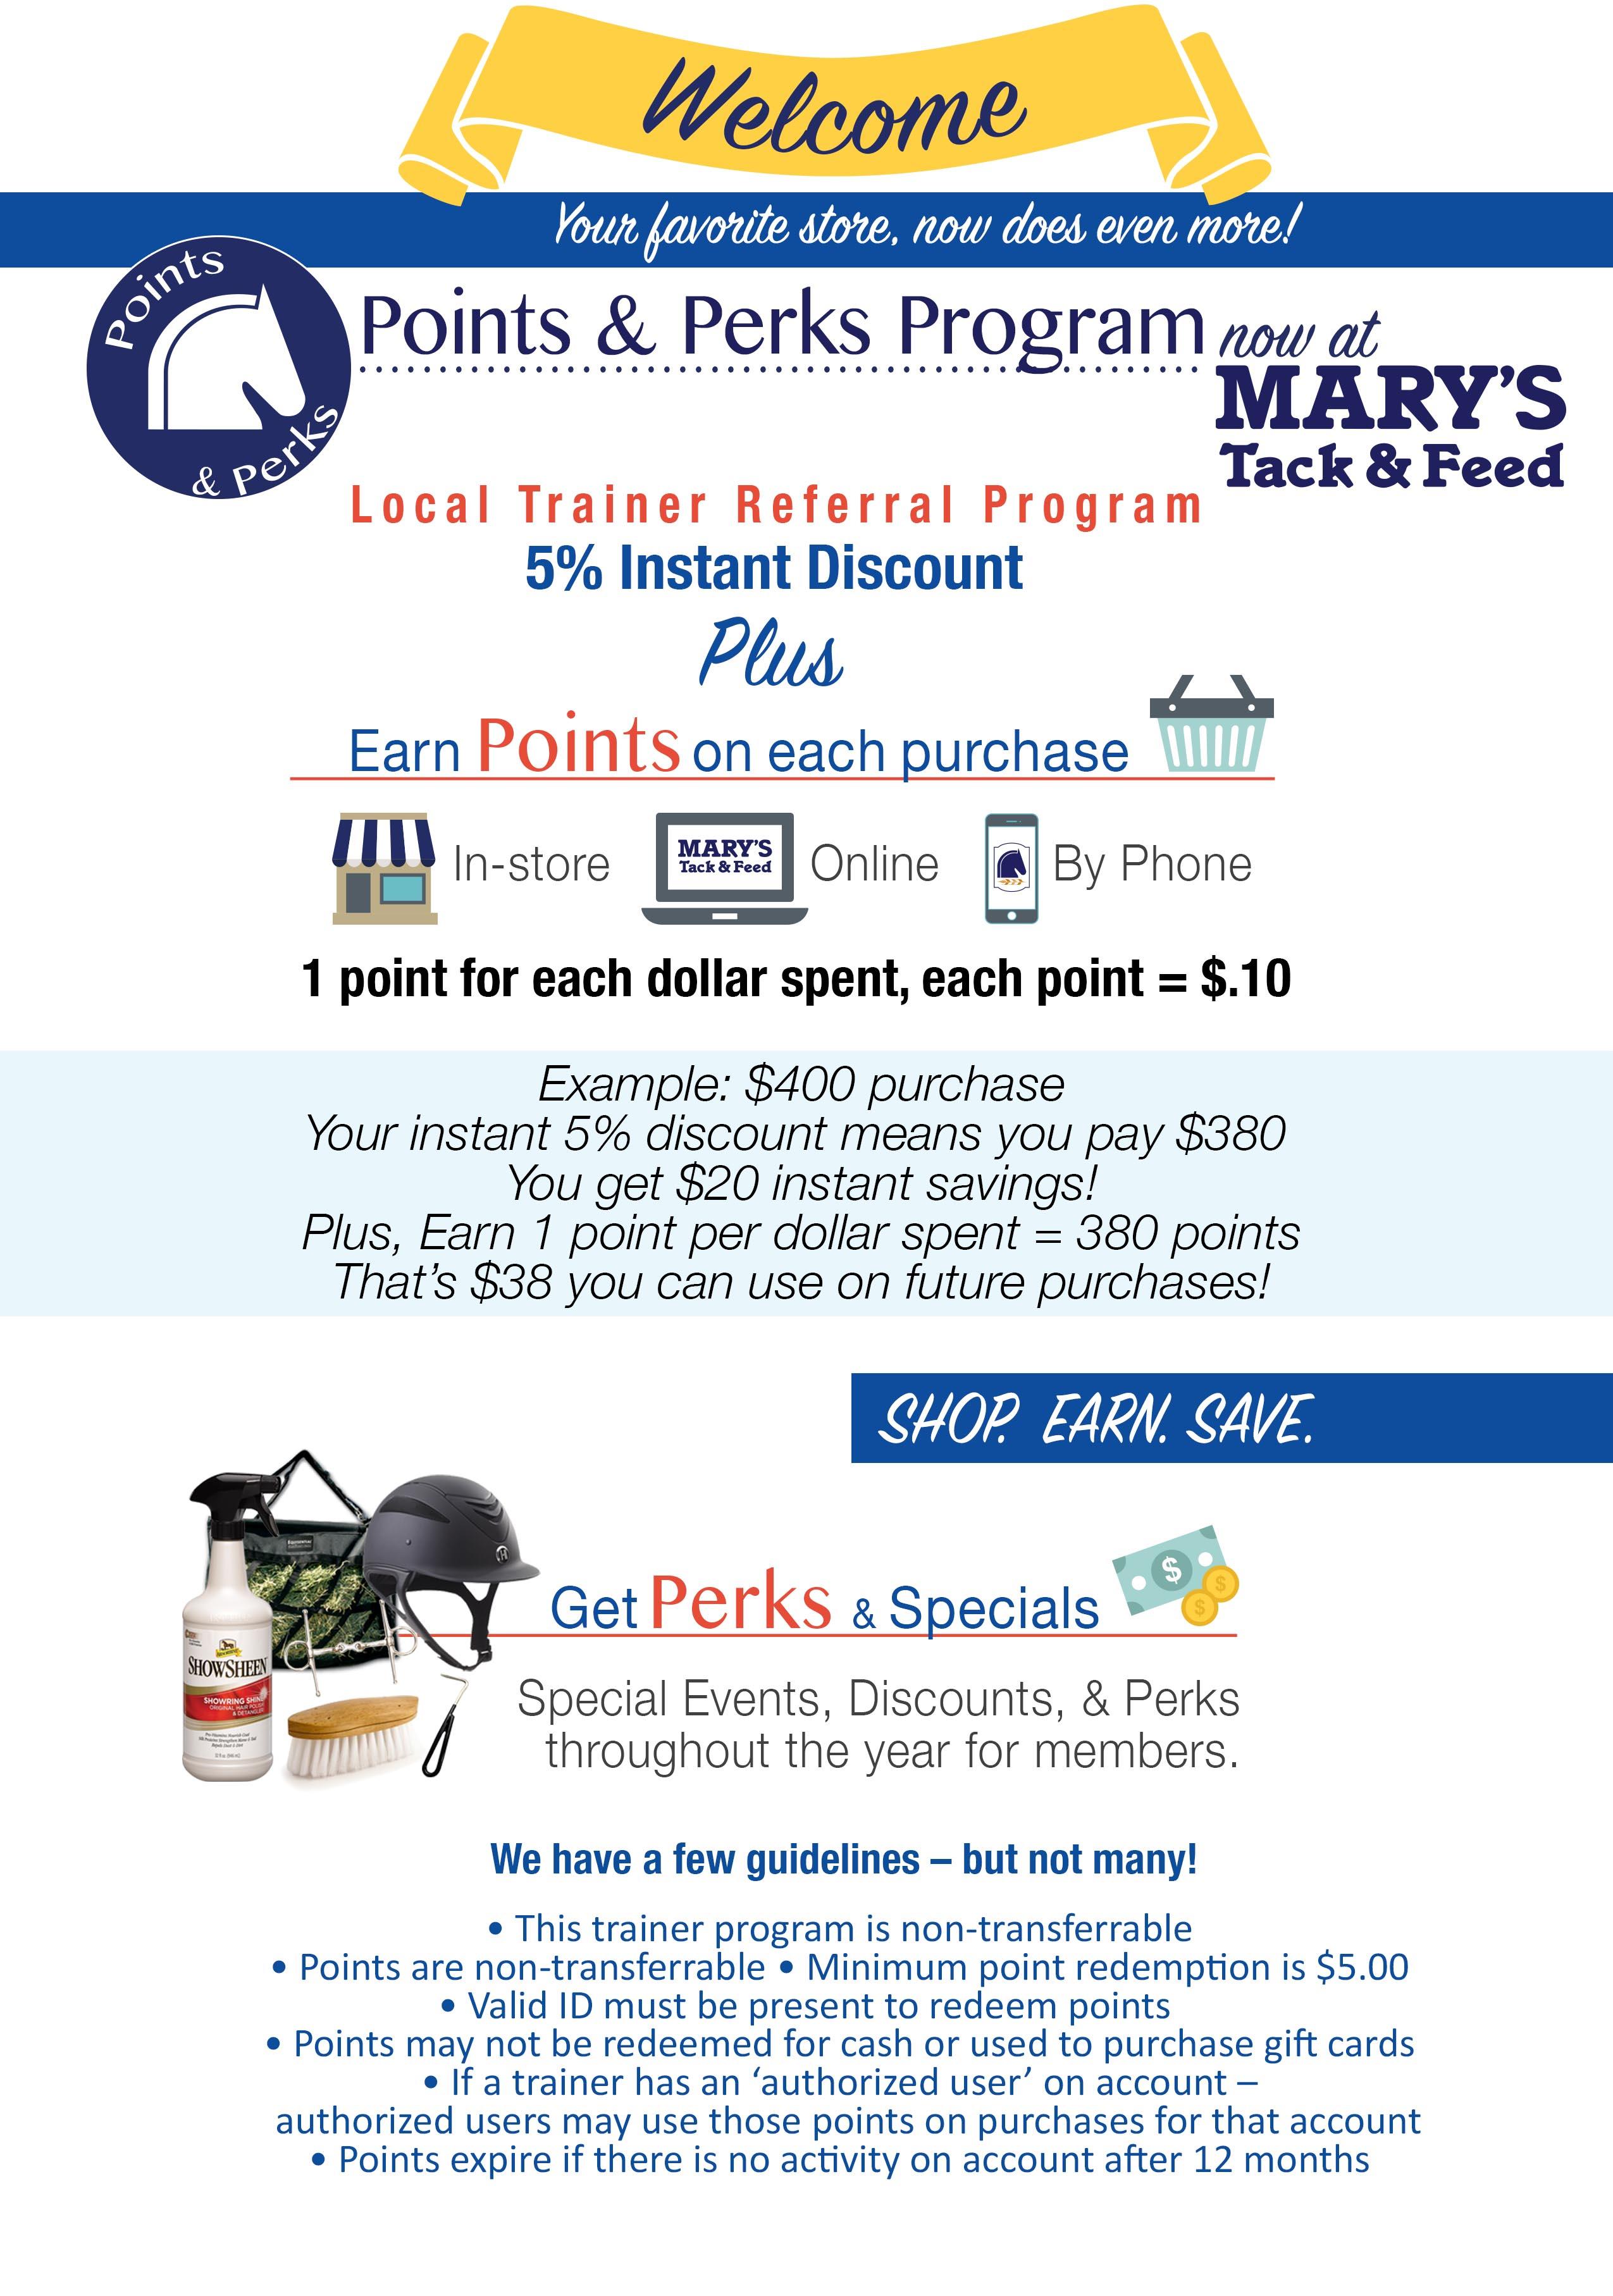 Local Trainer Points & Points Program